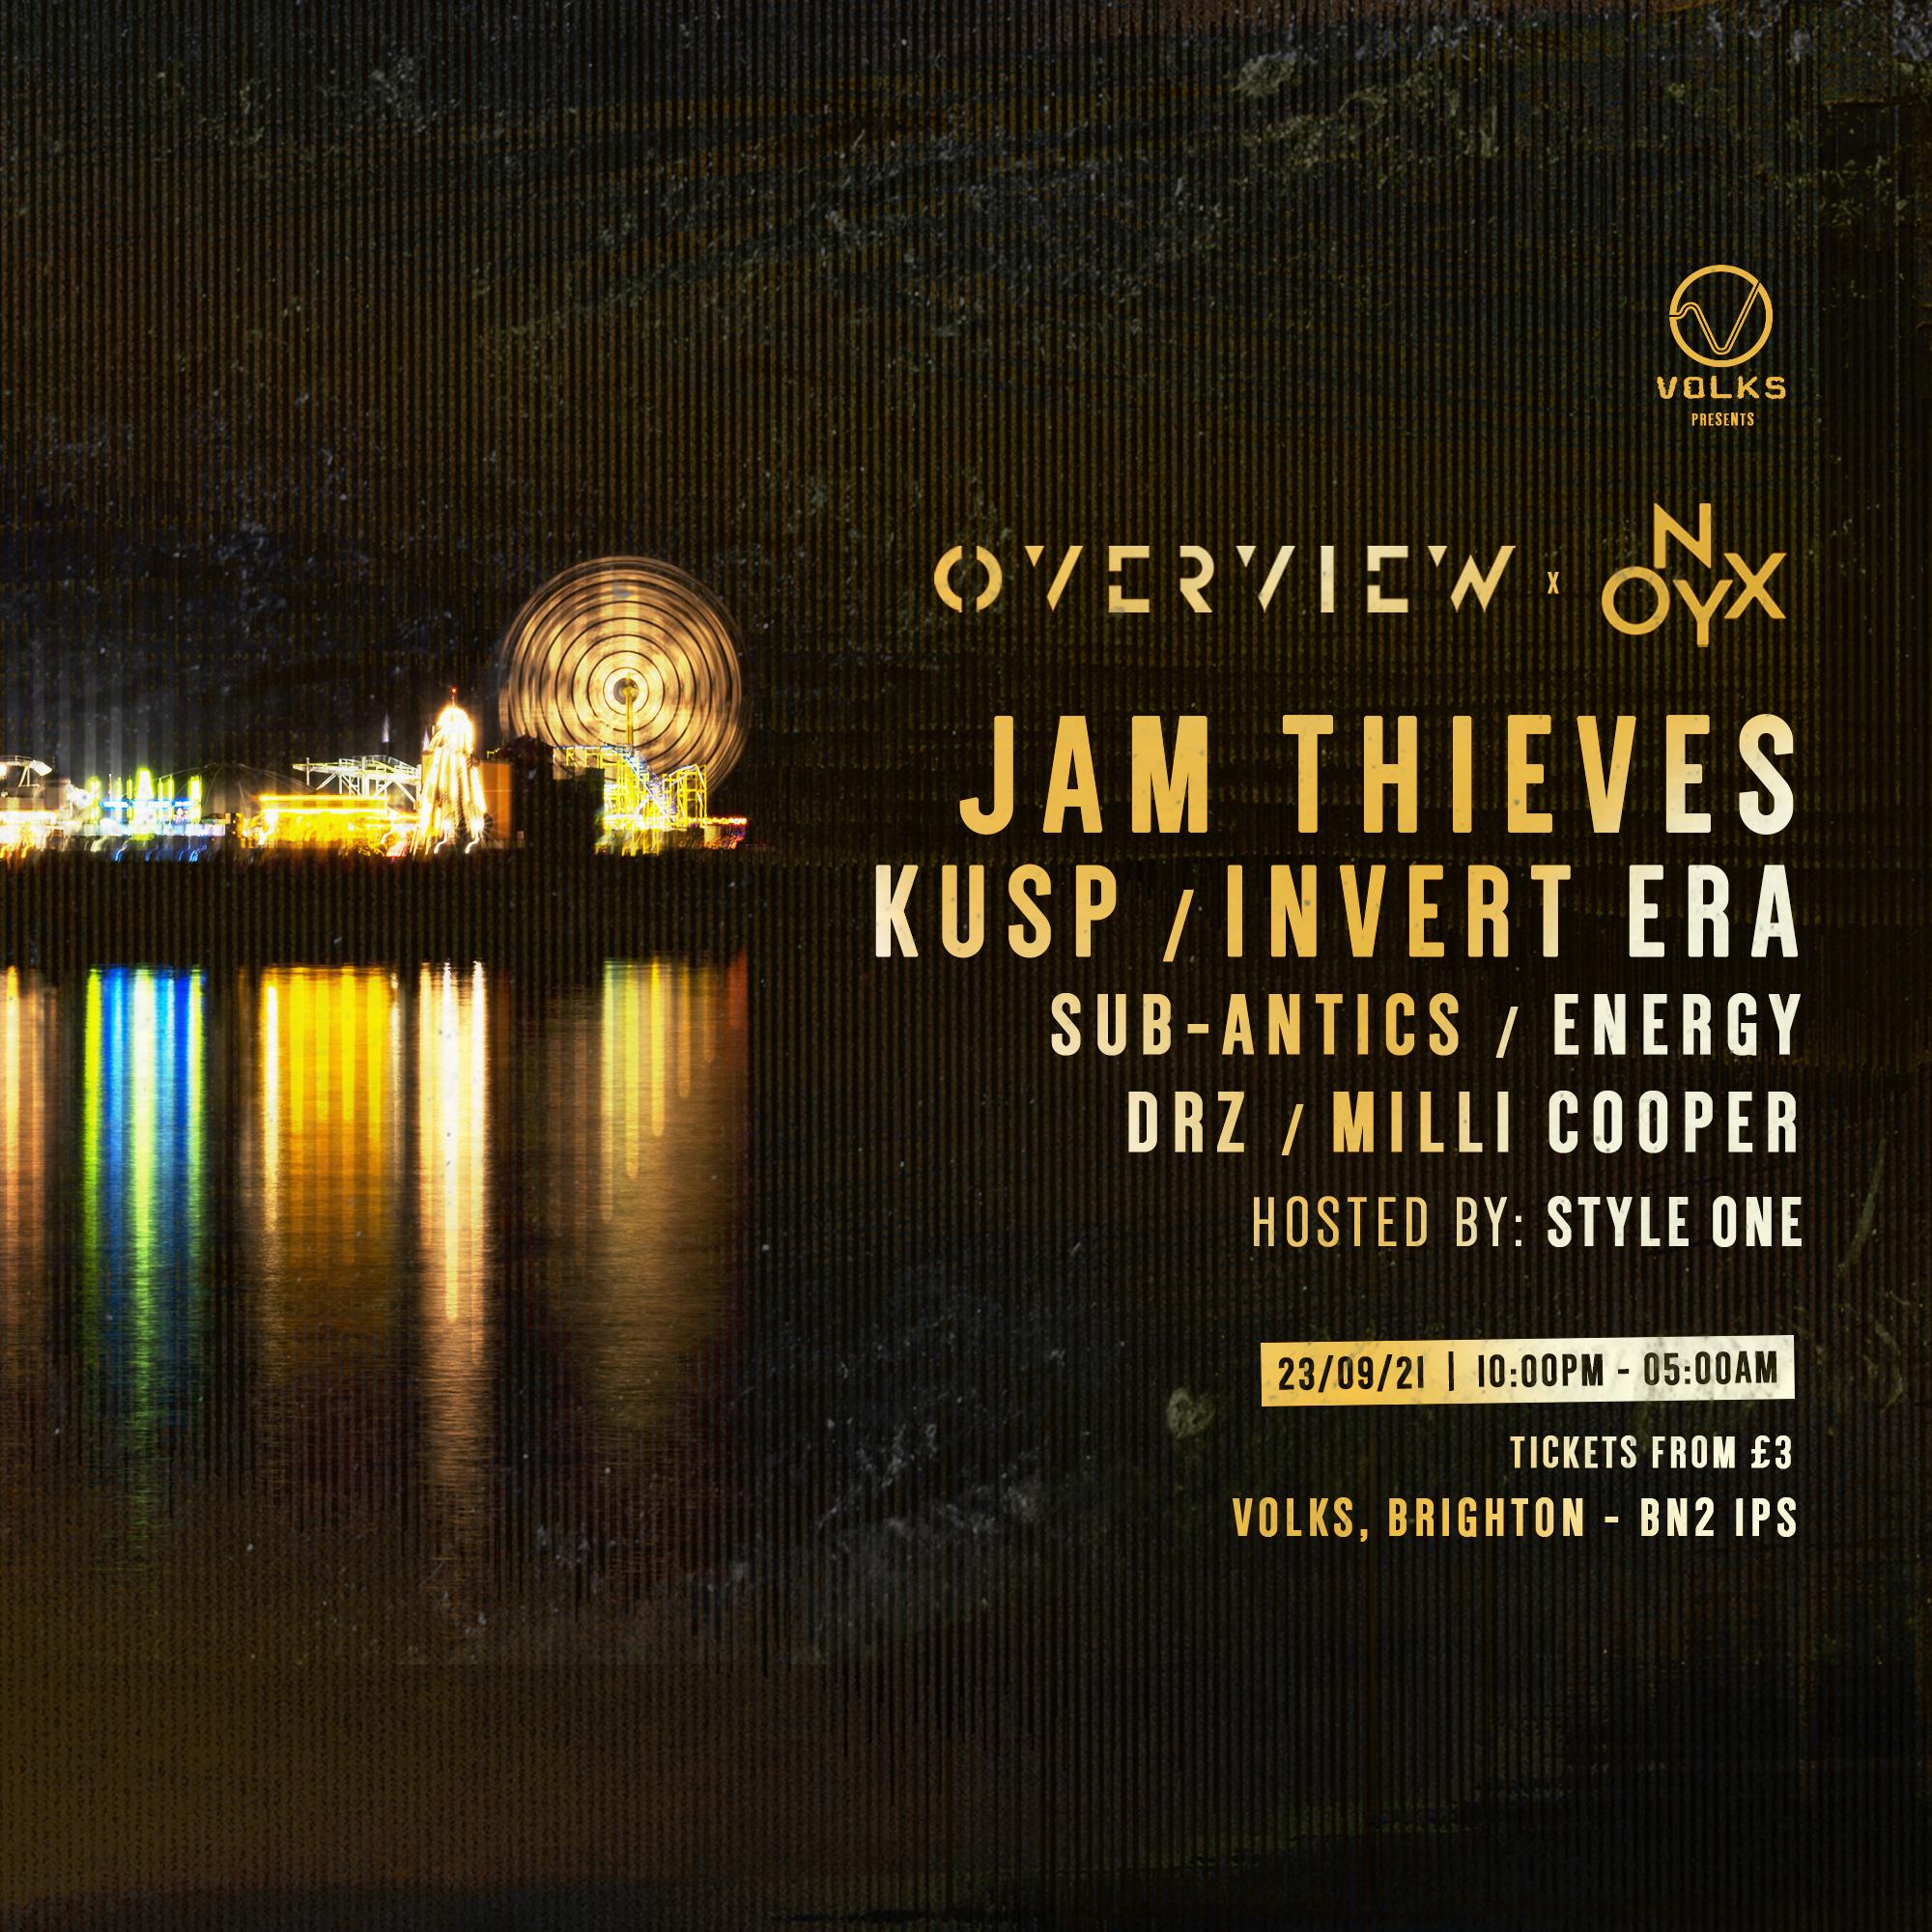 1361484_1_volks-presents-overview-x-onyx-jam-thieves-kusp-morevolks_eflyer